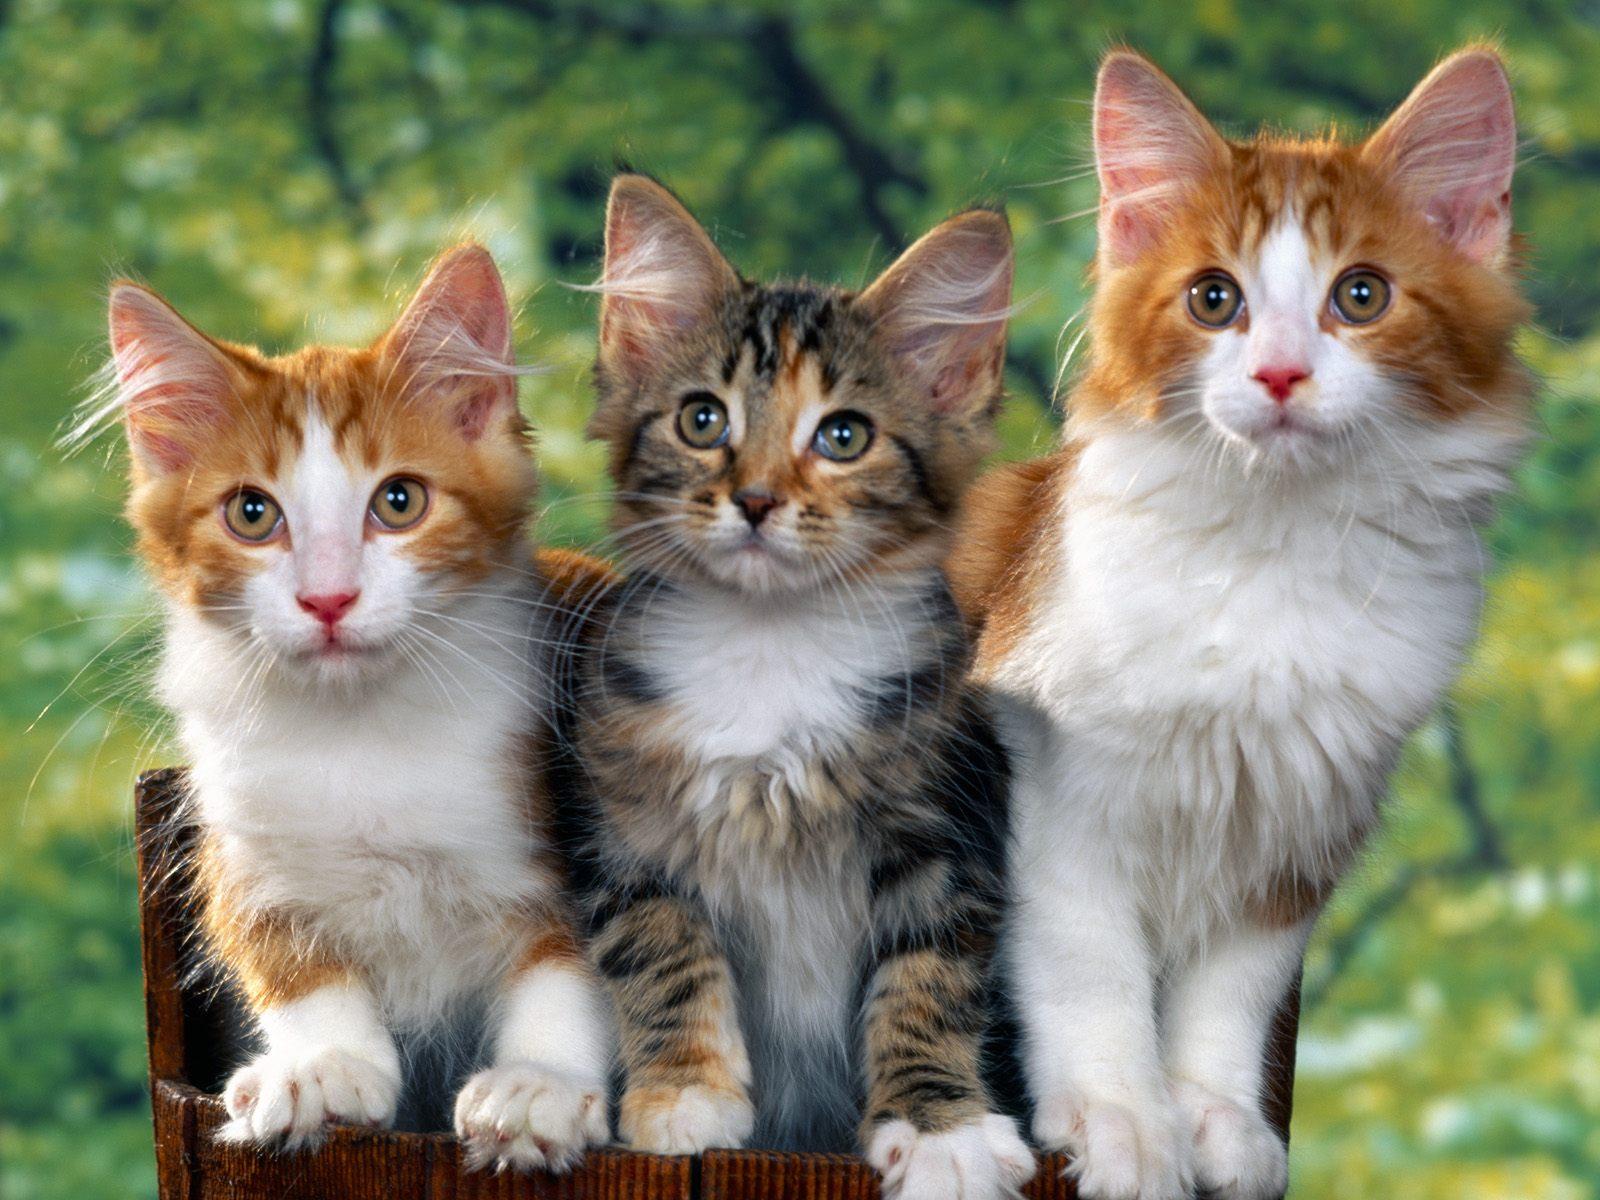 http://3.bp.blogspot.com/-JuNJu9KCBW4/Tn6jfHlZ4eI/AAAAAAAACWo/-aQMLFnnwsY/s1600/3-Cats.jpg